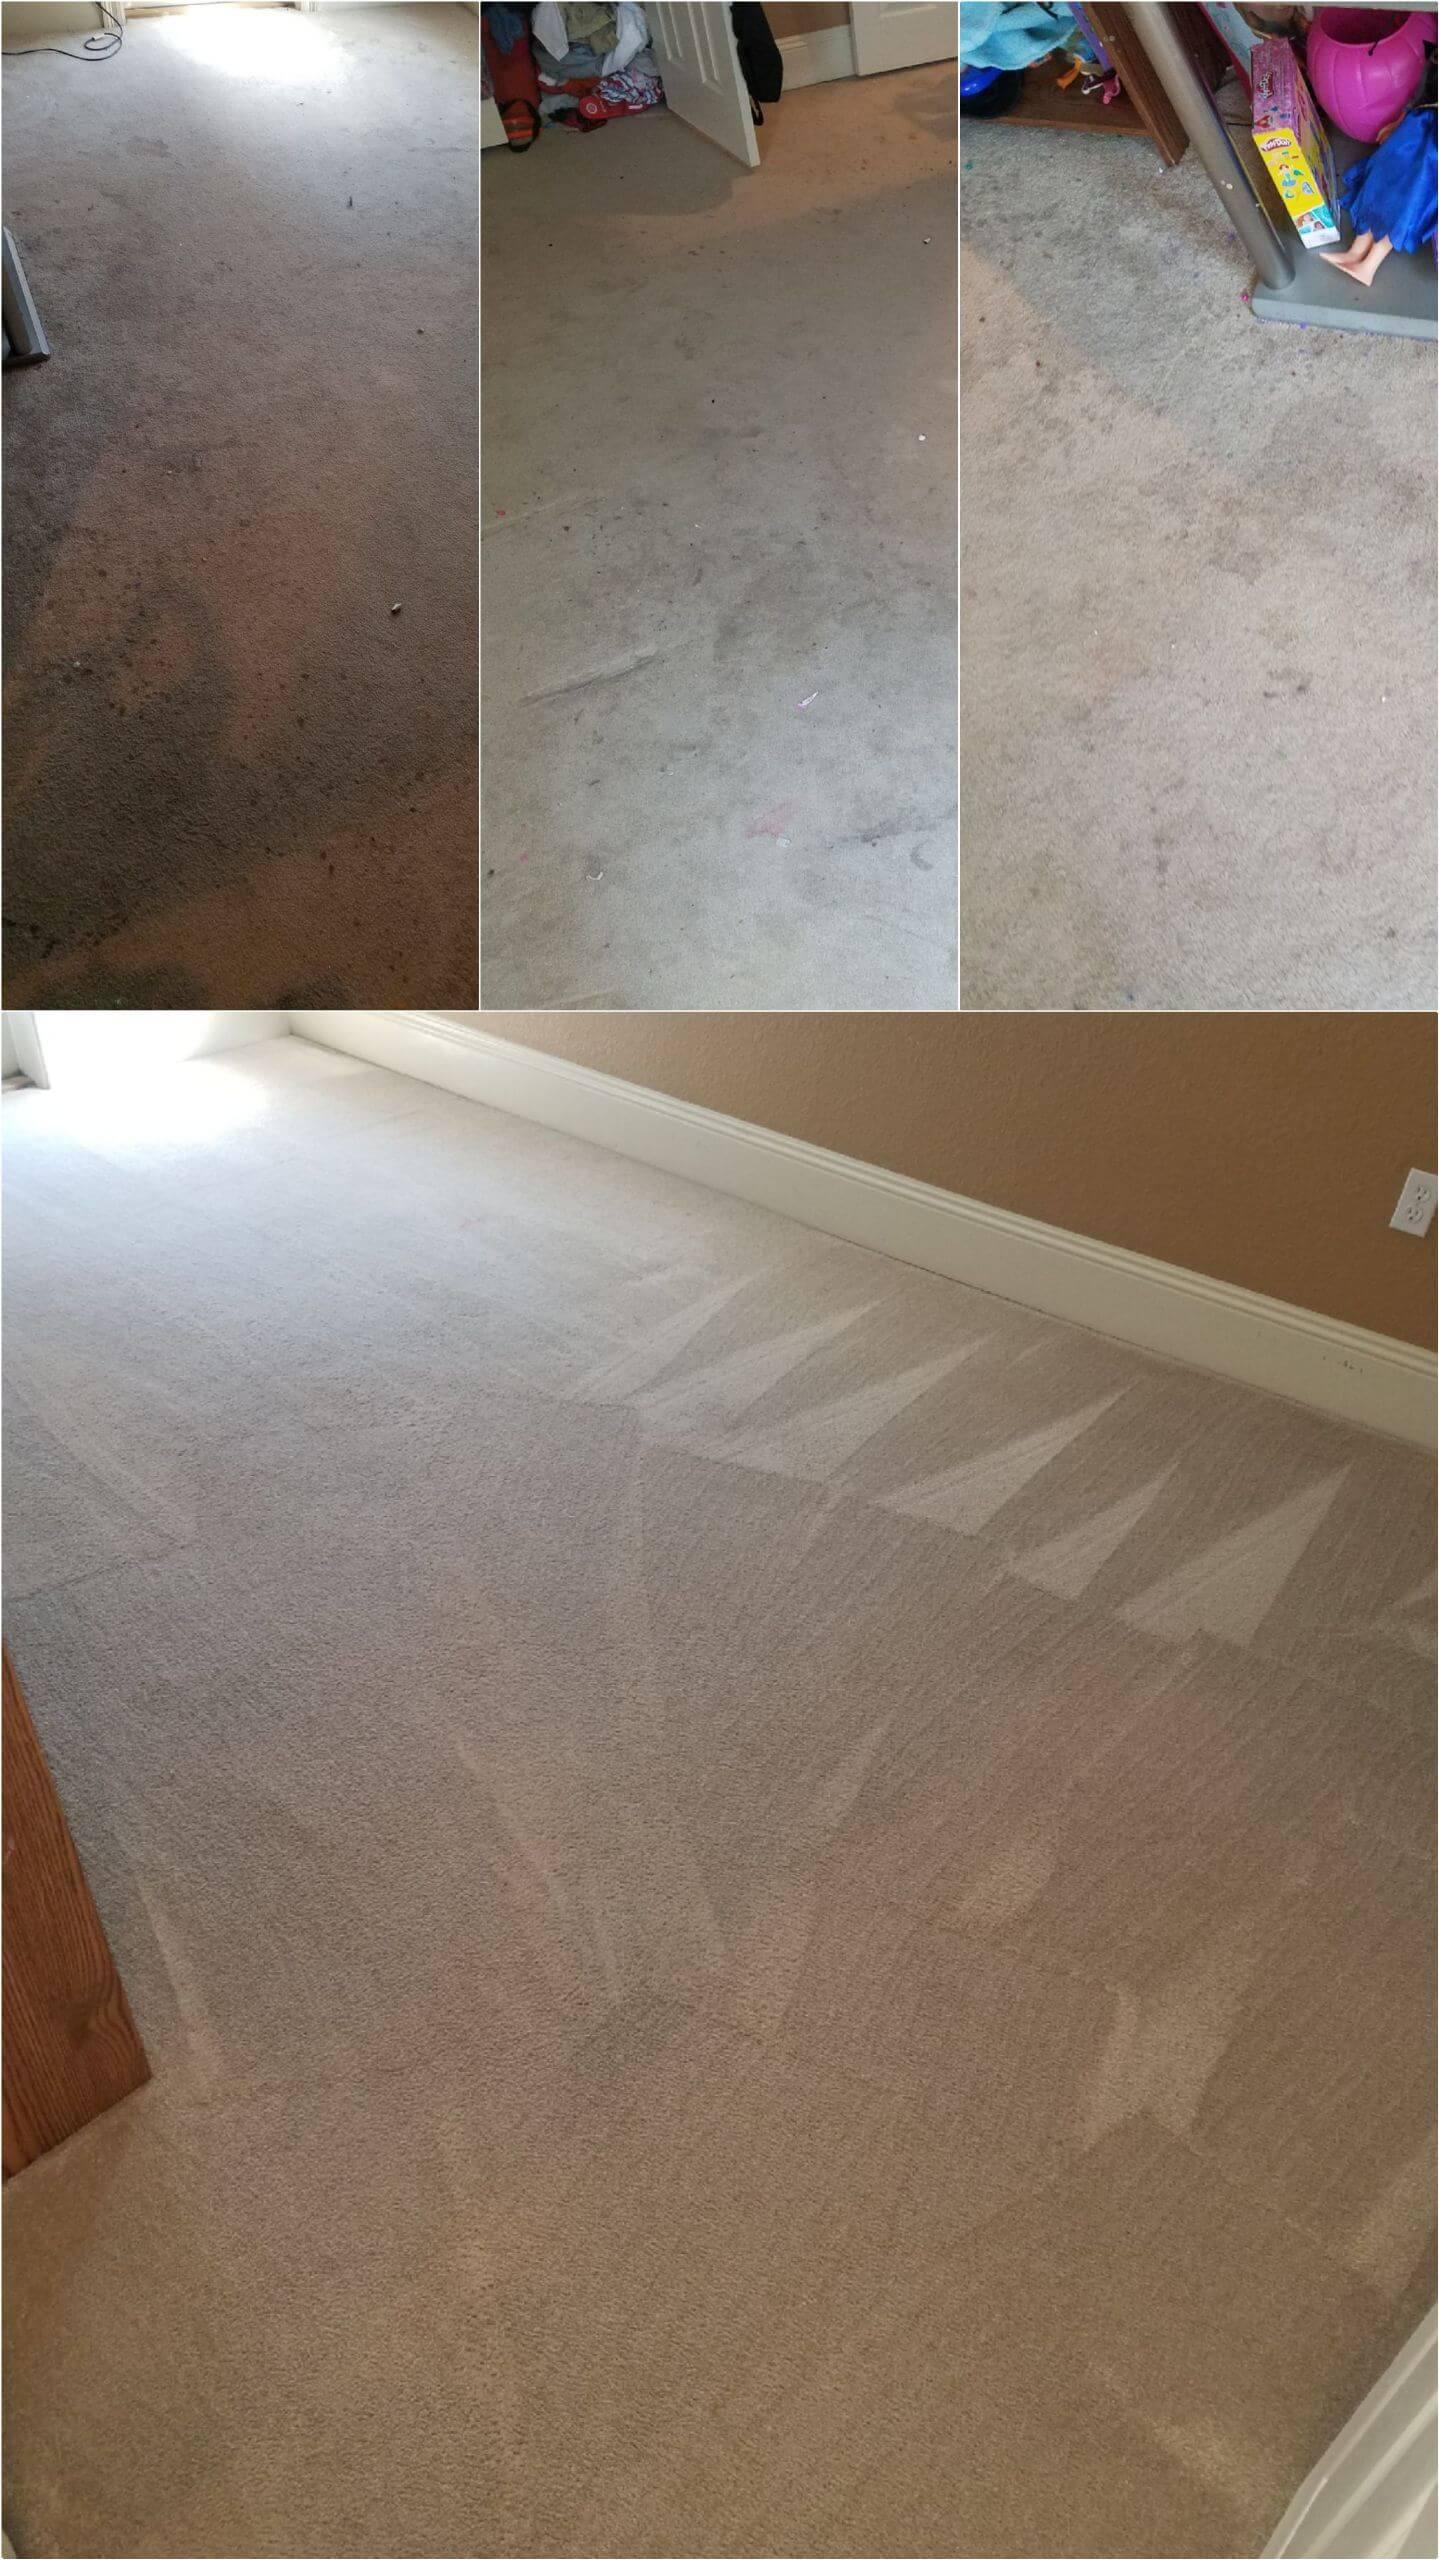 Carpet Cleaning Niceville Fl